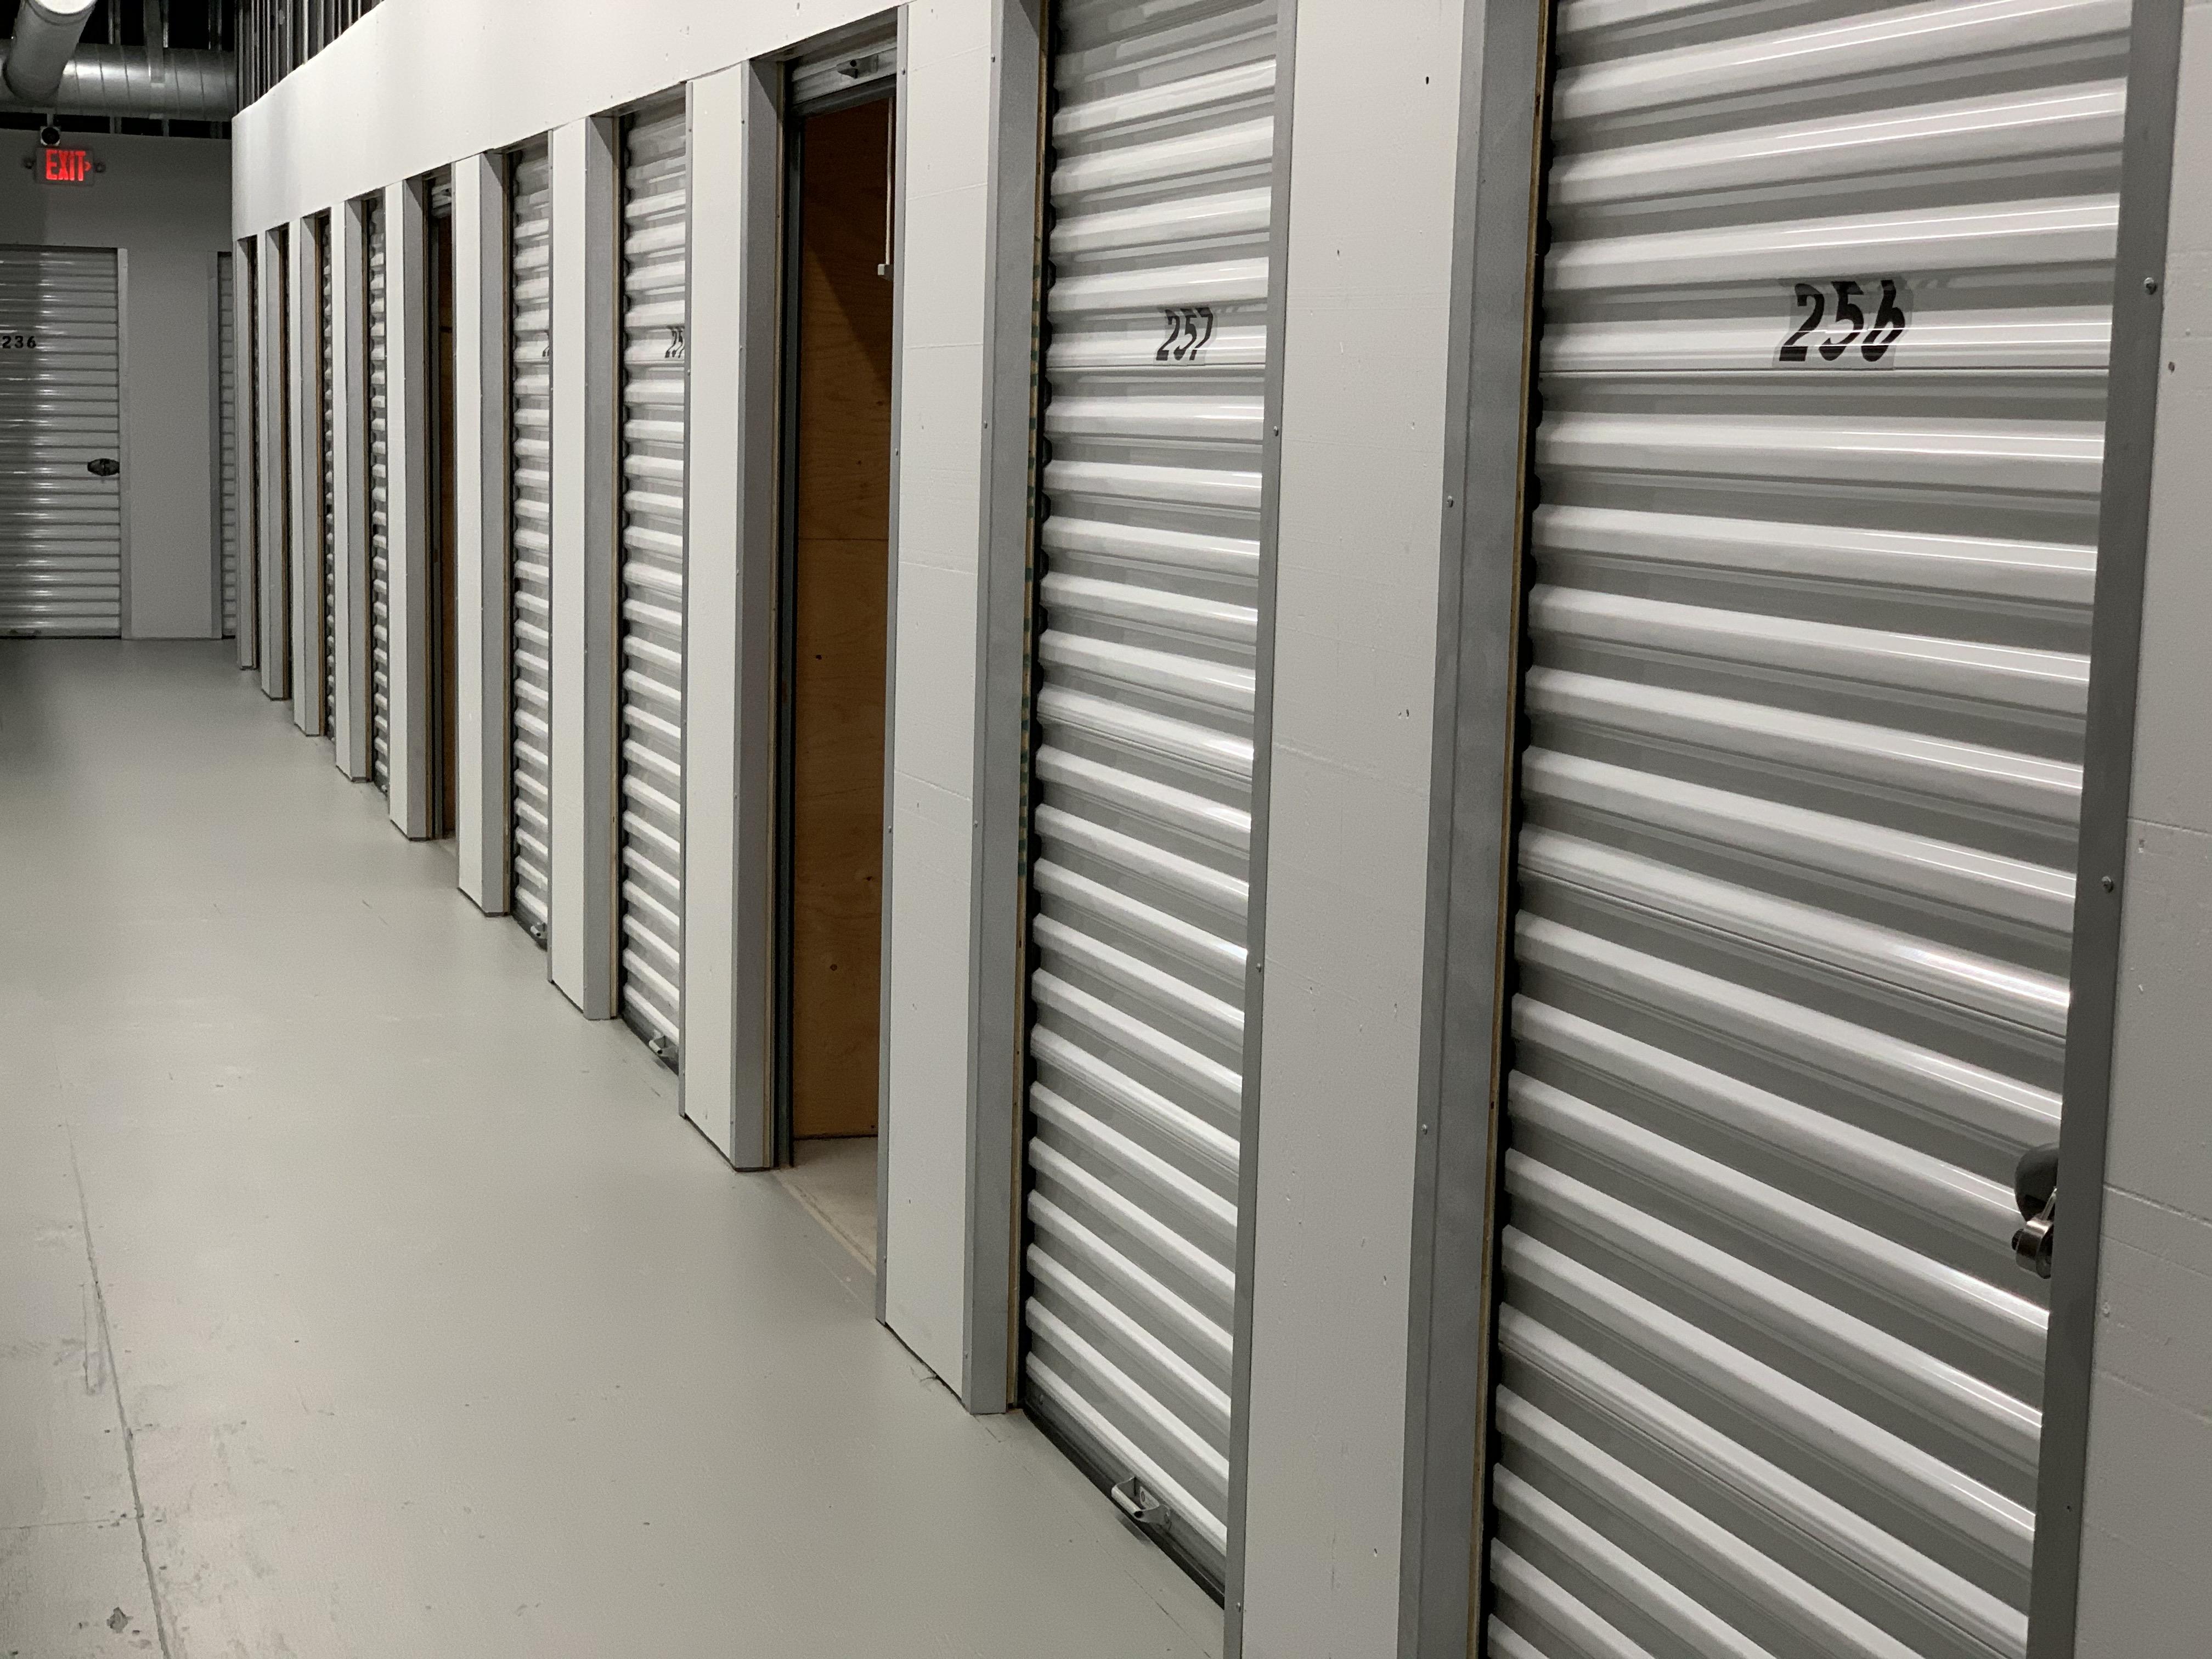 interior storage units in eyota, mn